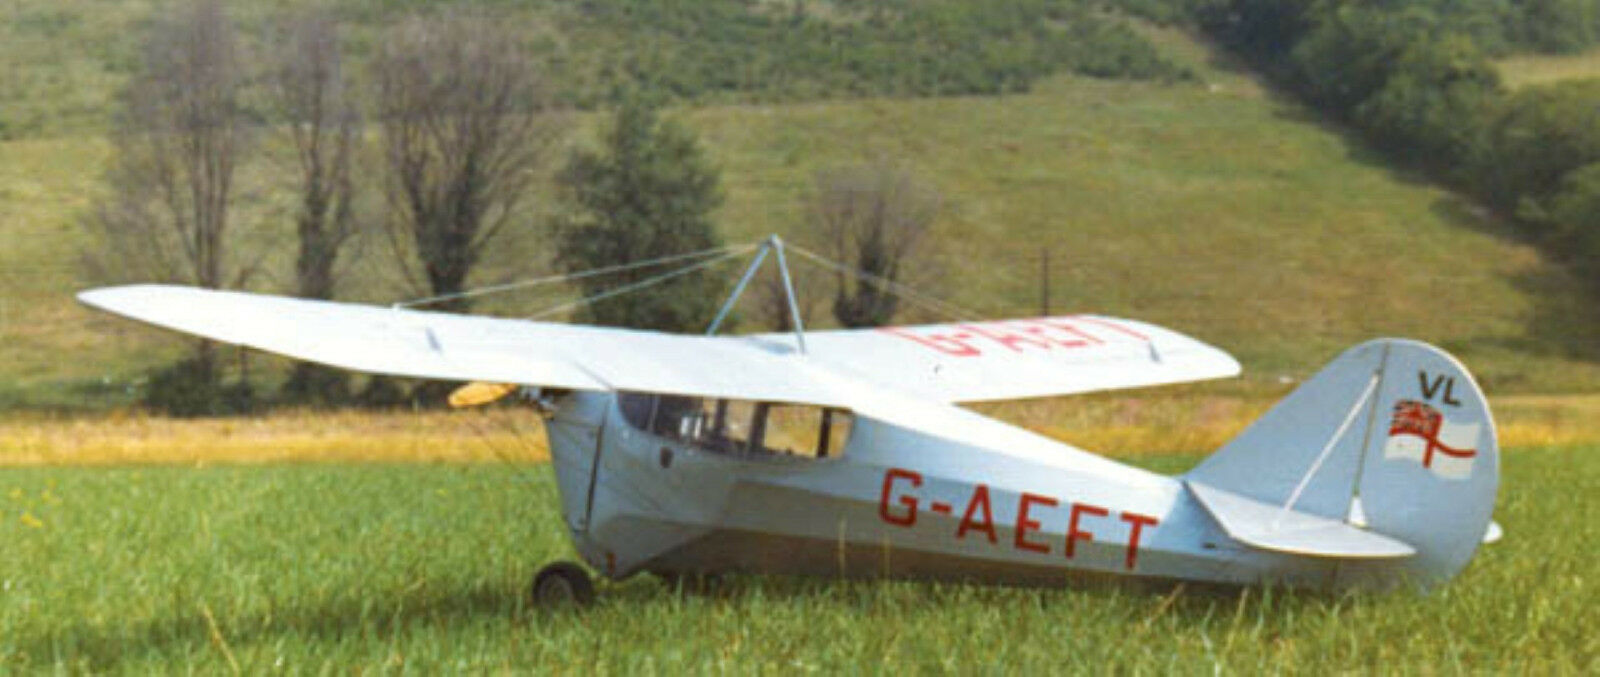 AERONCA C-3 (Spannweite 2057 mm).UL Leichtflugzeug.USA. modelllbausplan